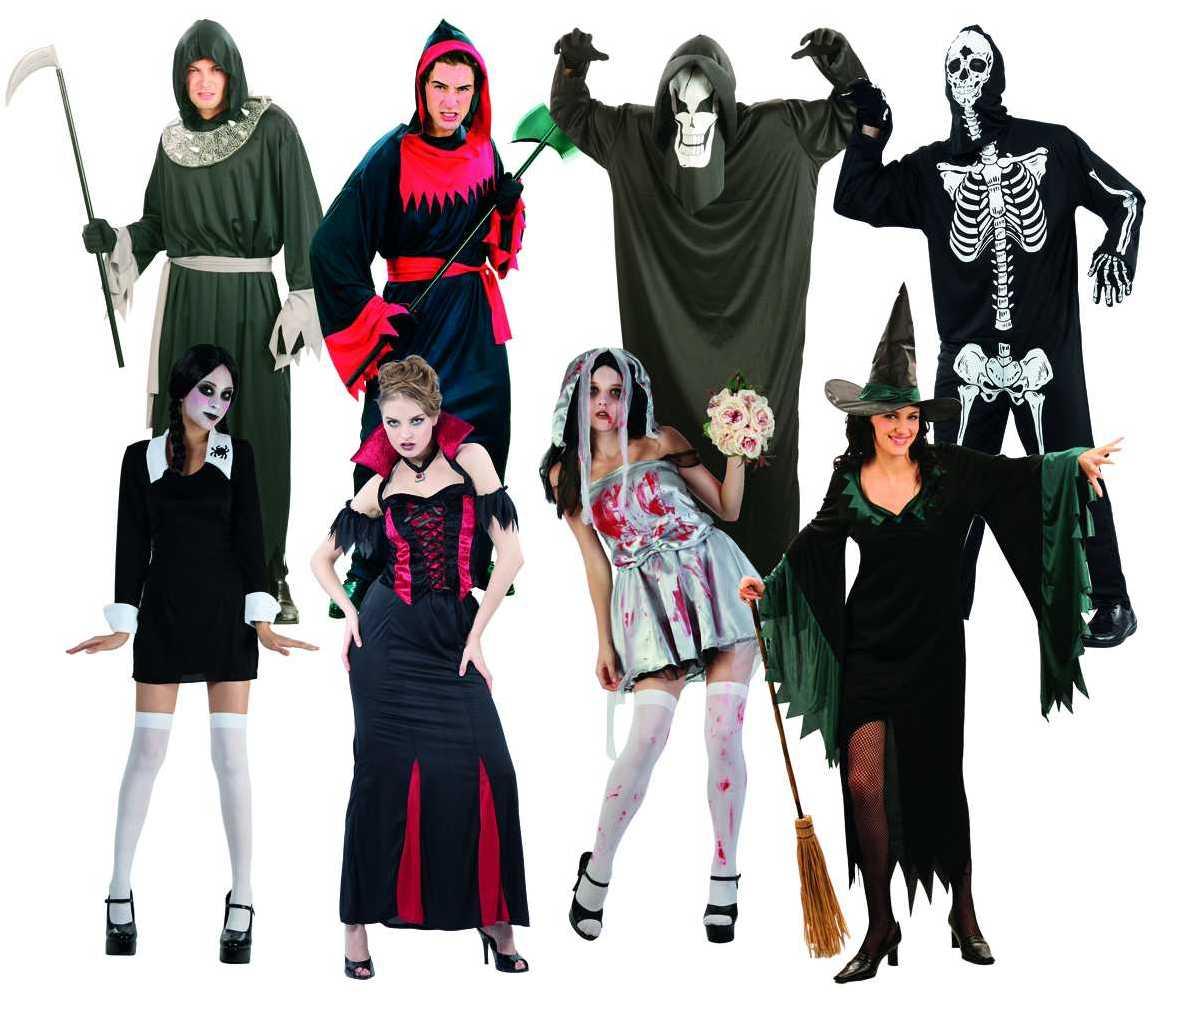 Costumi Halloween Adulti.Costume Halloween Adulto Jolly Toys Addobbi Ed Articoli Per